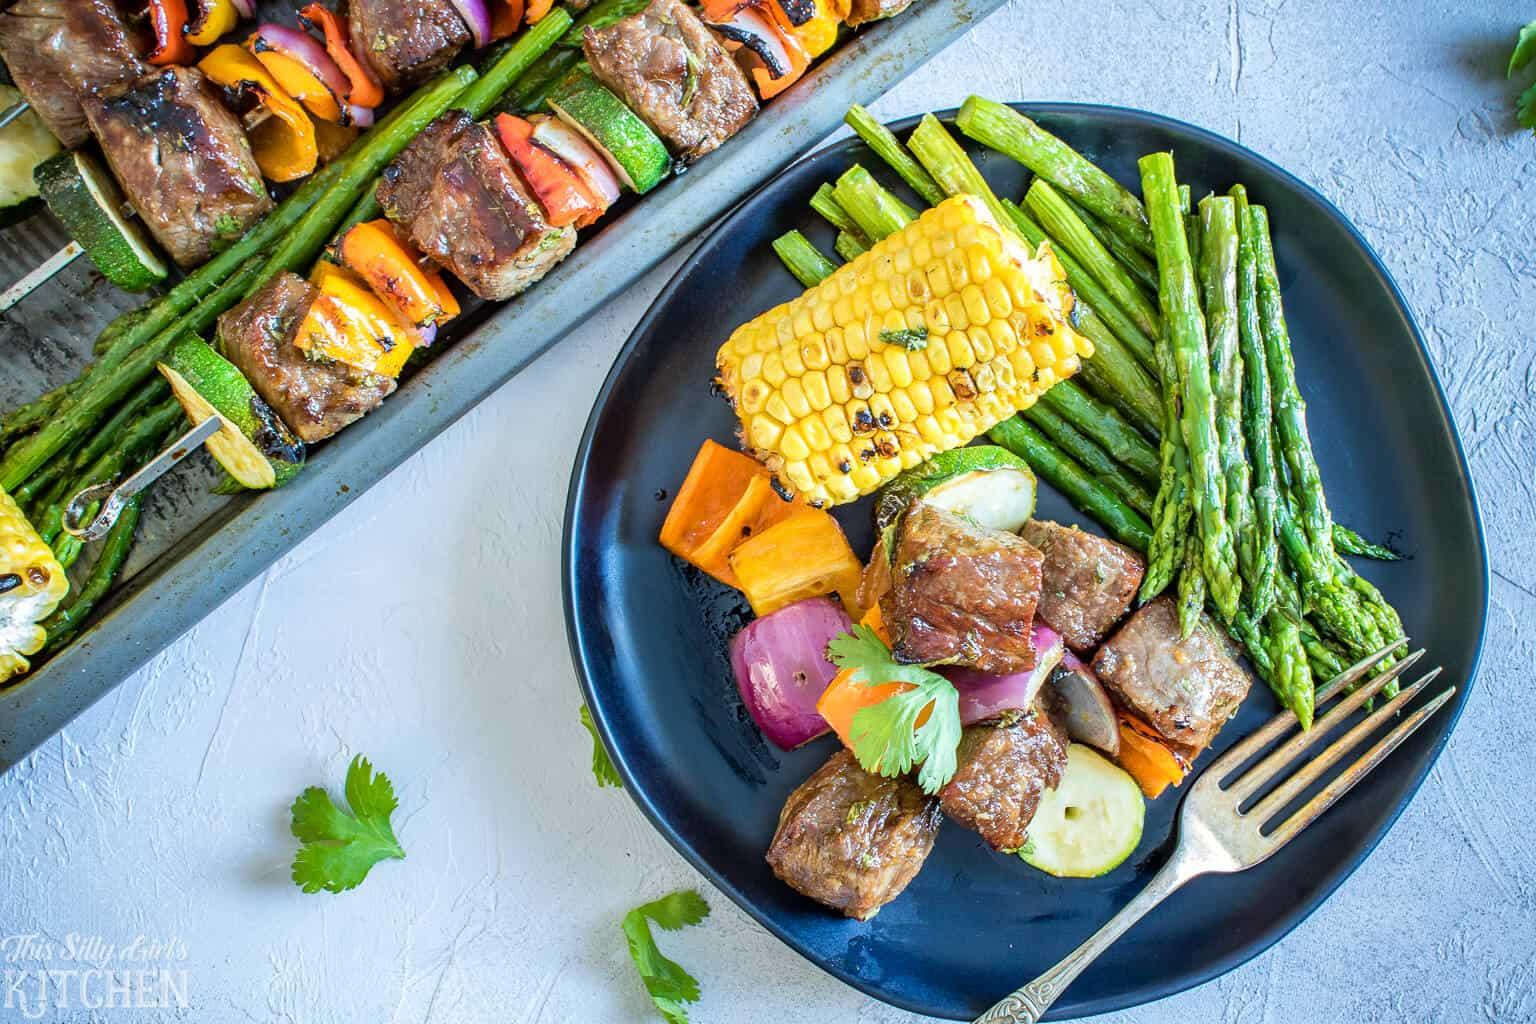 Carne Asada Steak Kabobs, NY strip marinated in the BEST marinade with lots of yummy veggies! #Recipe from ThisSillyGirlsKitchen.com #kabobs #steakkabob #carneasada